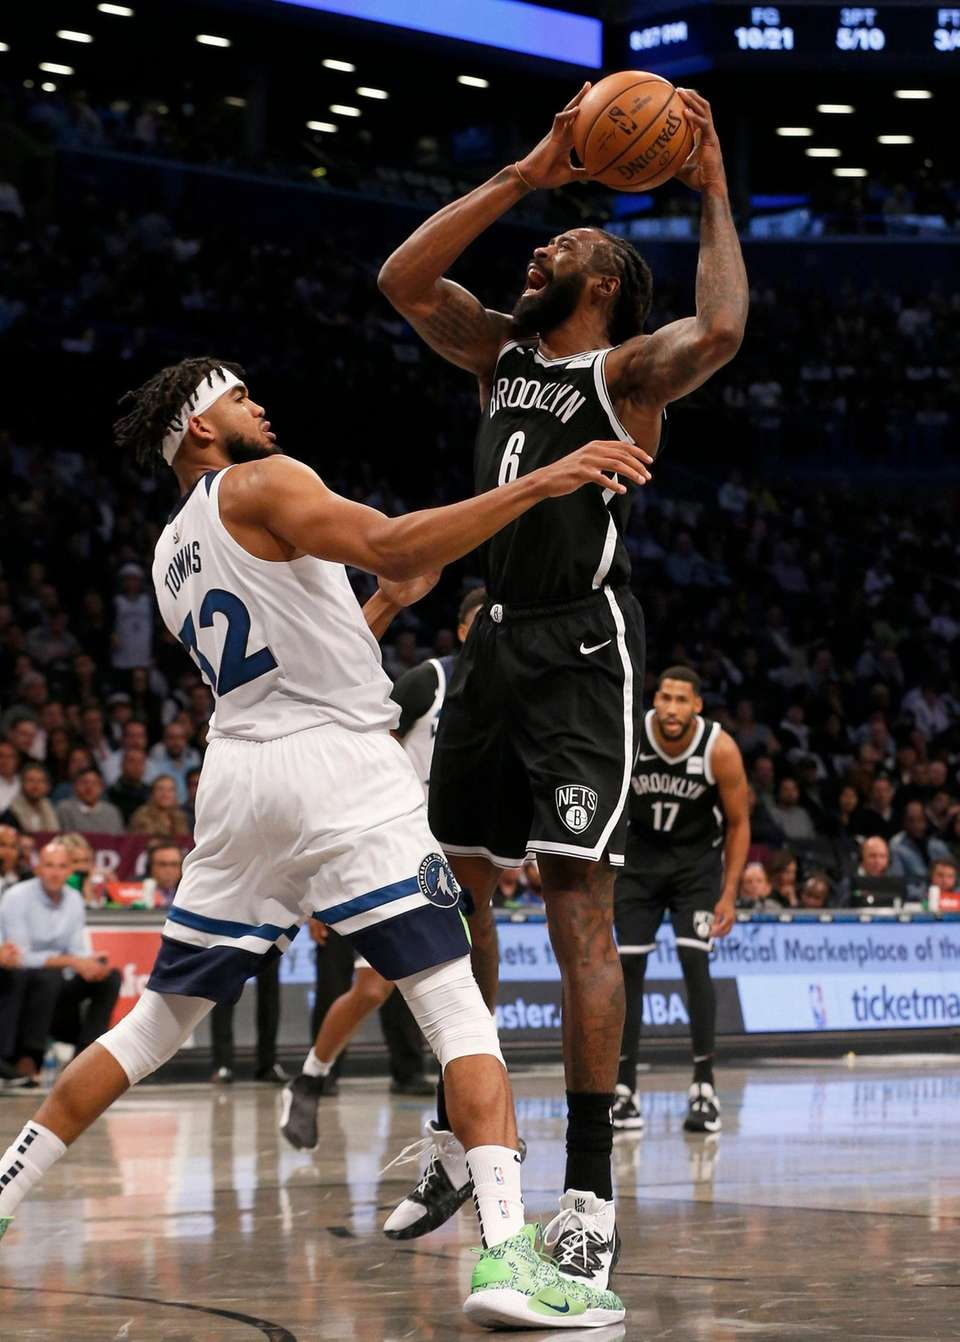 DeAndre Jordan #6 of the Brooklyn Nets controls